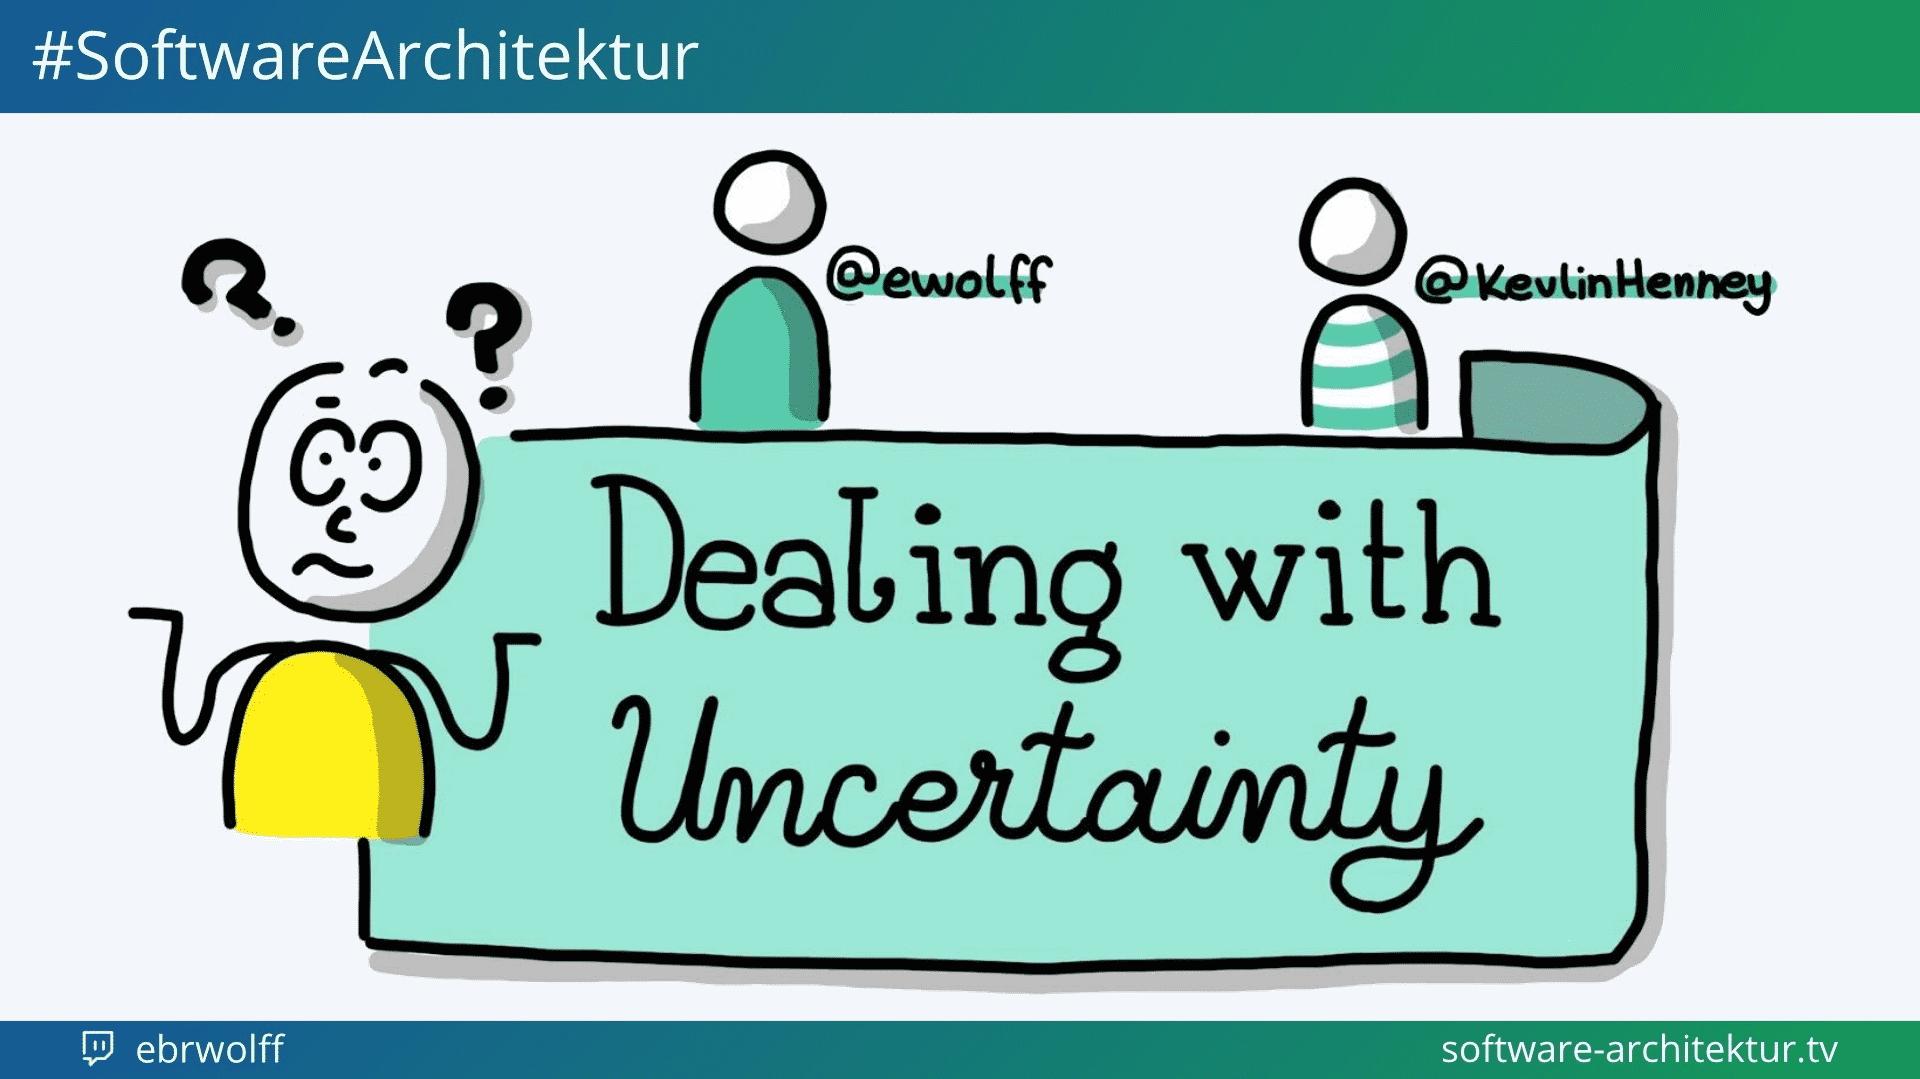 software-architektur.tv: Dealing with Uncertainty